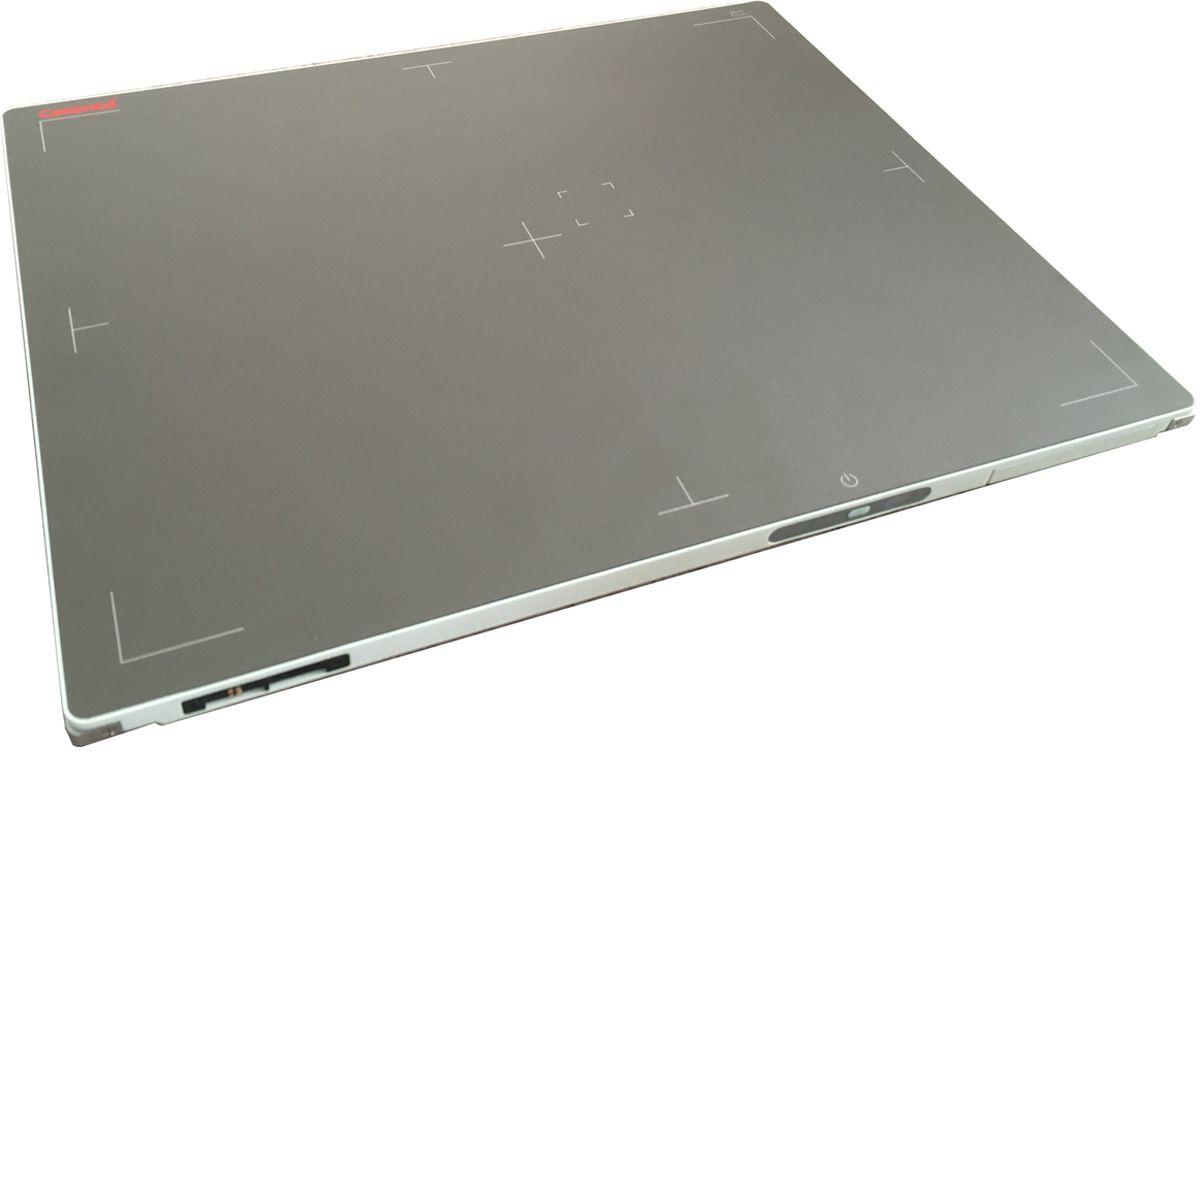 Digital X-Ray product range